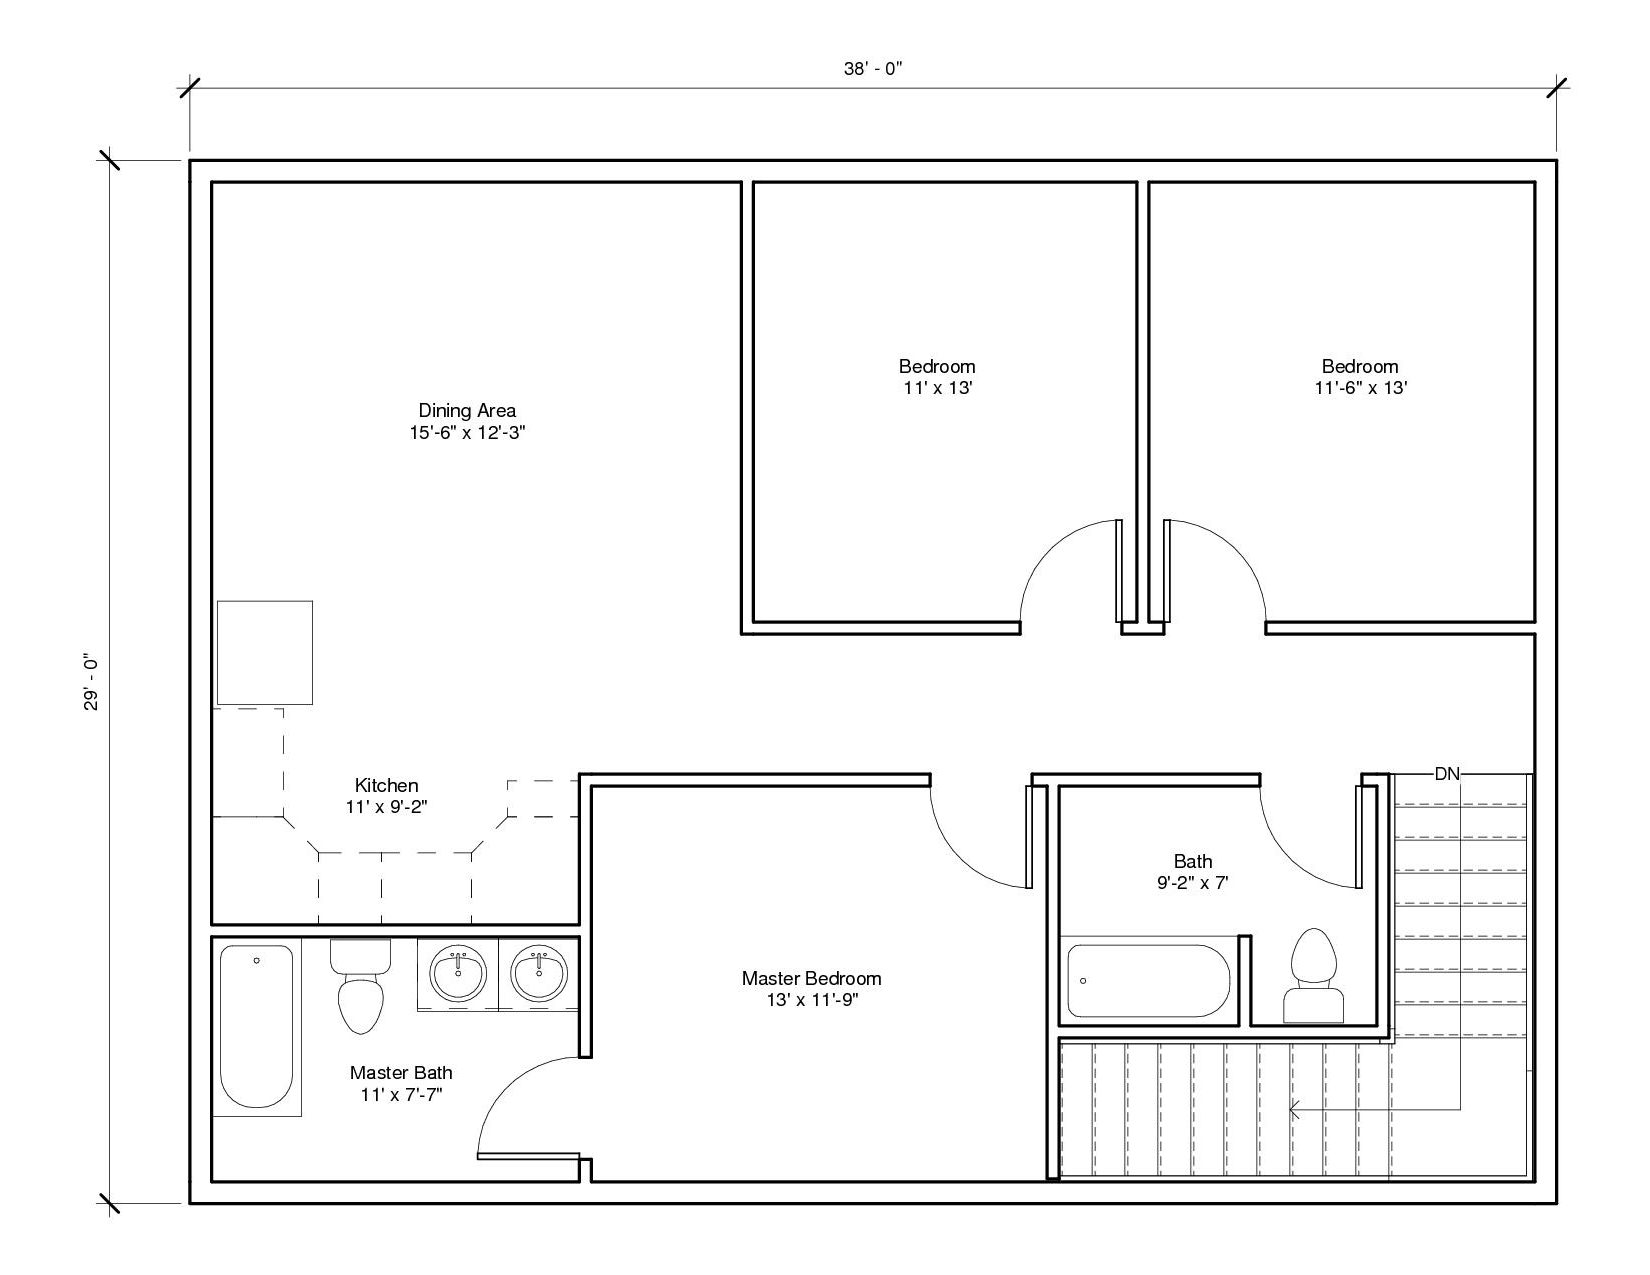 Studio Garage1A 2nd Floor1 Plan